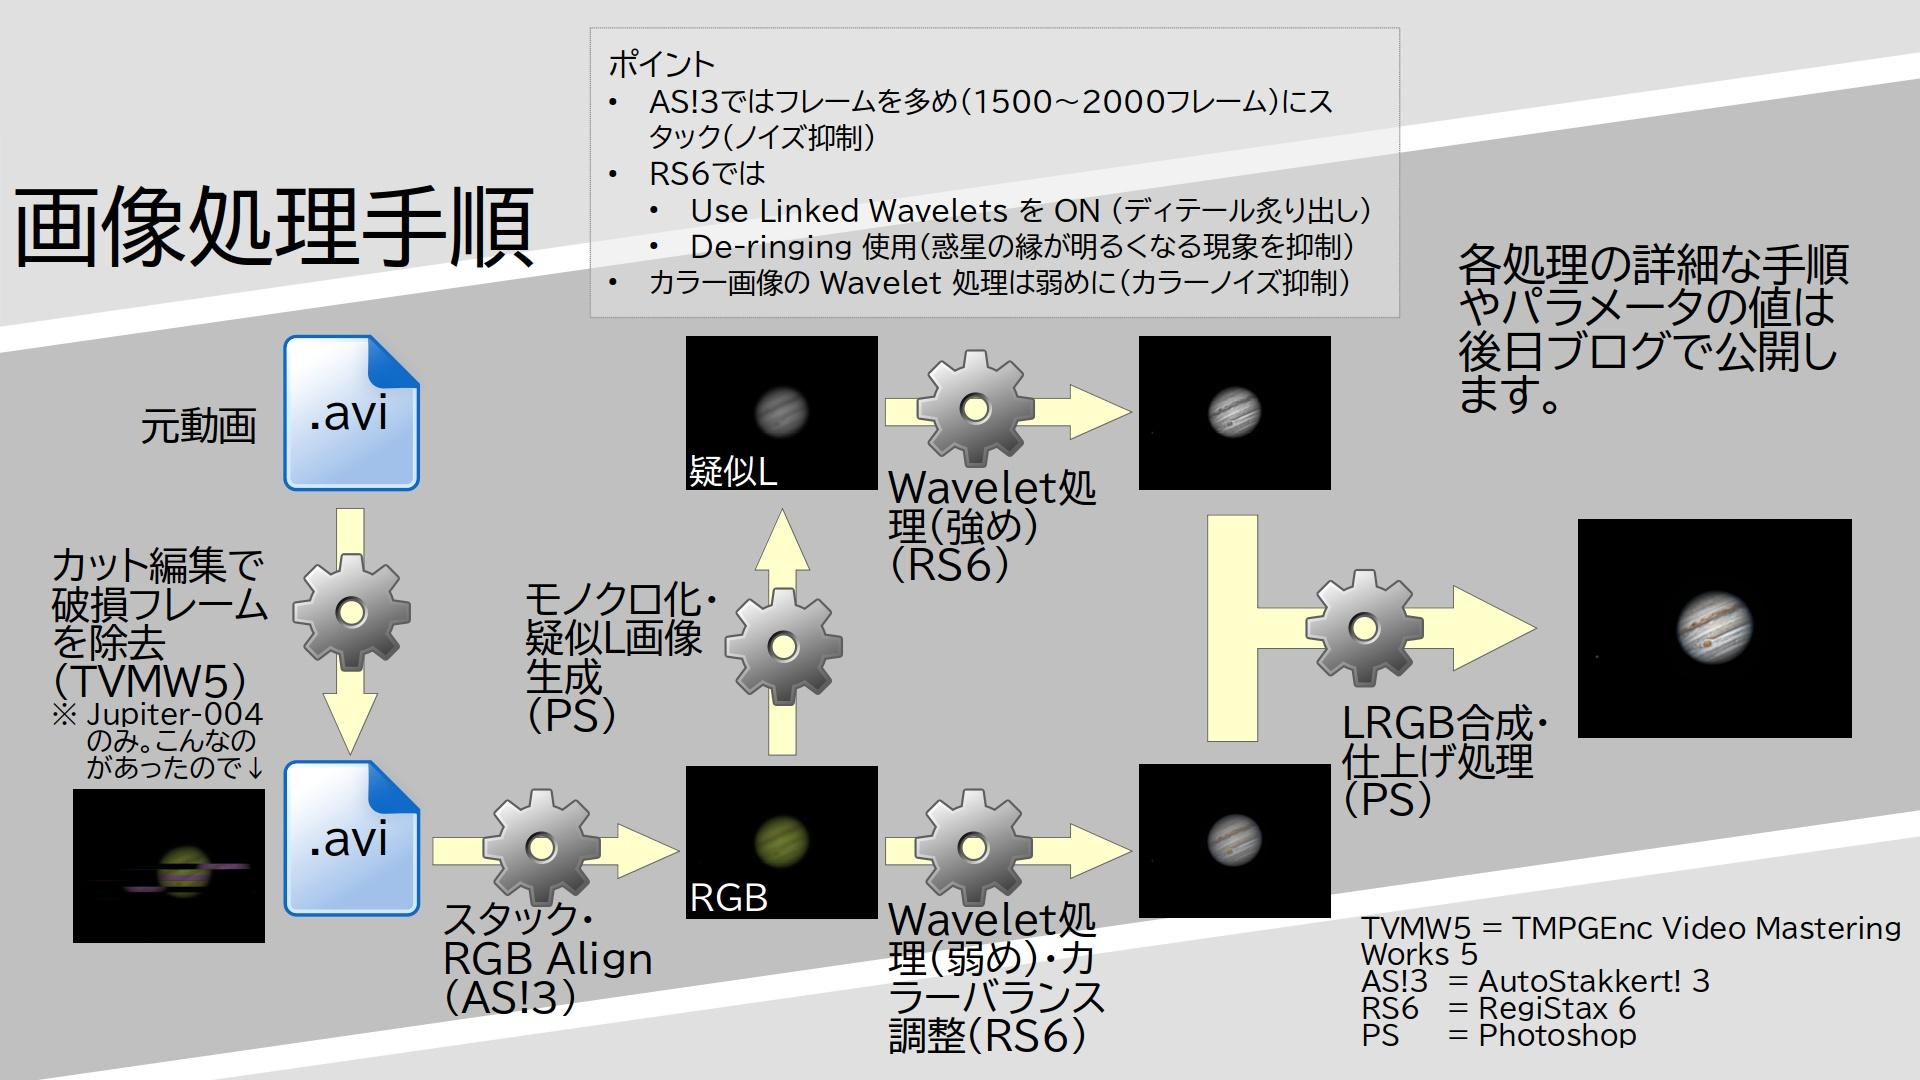 https://rna.sakura.ne.jp/share/tenkaichi-planet-nanba-20200607-02.jpg